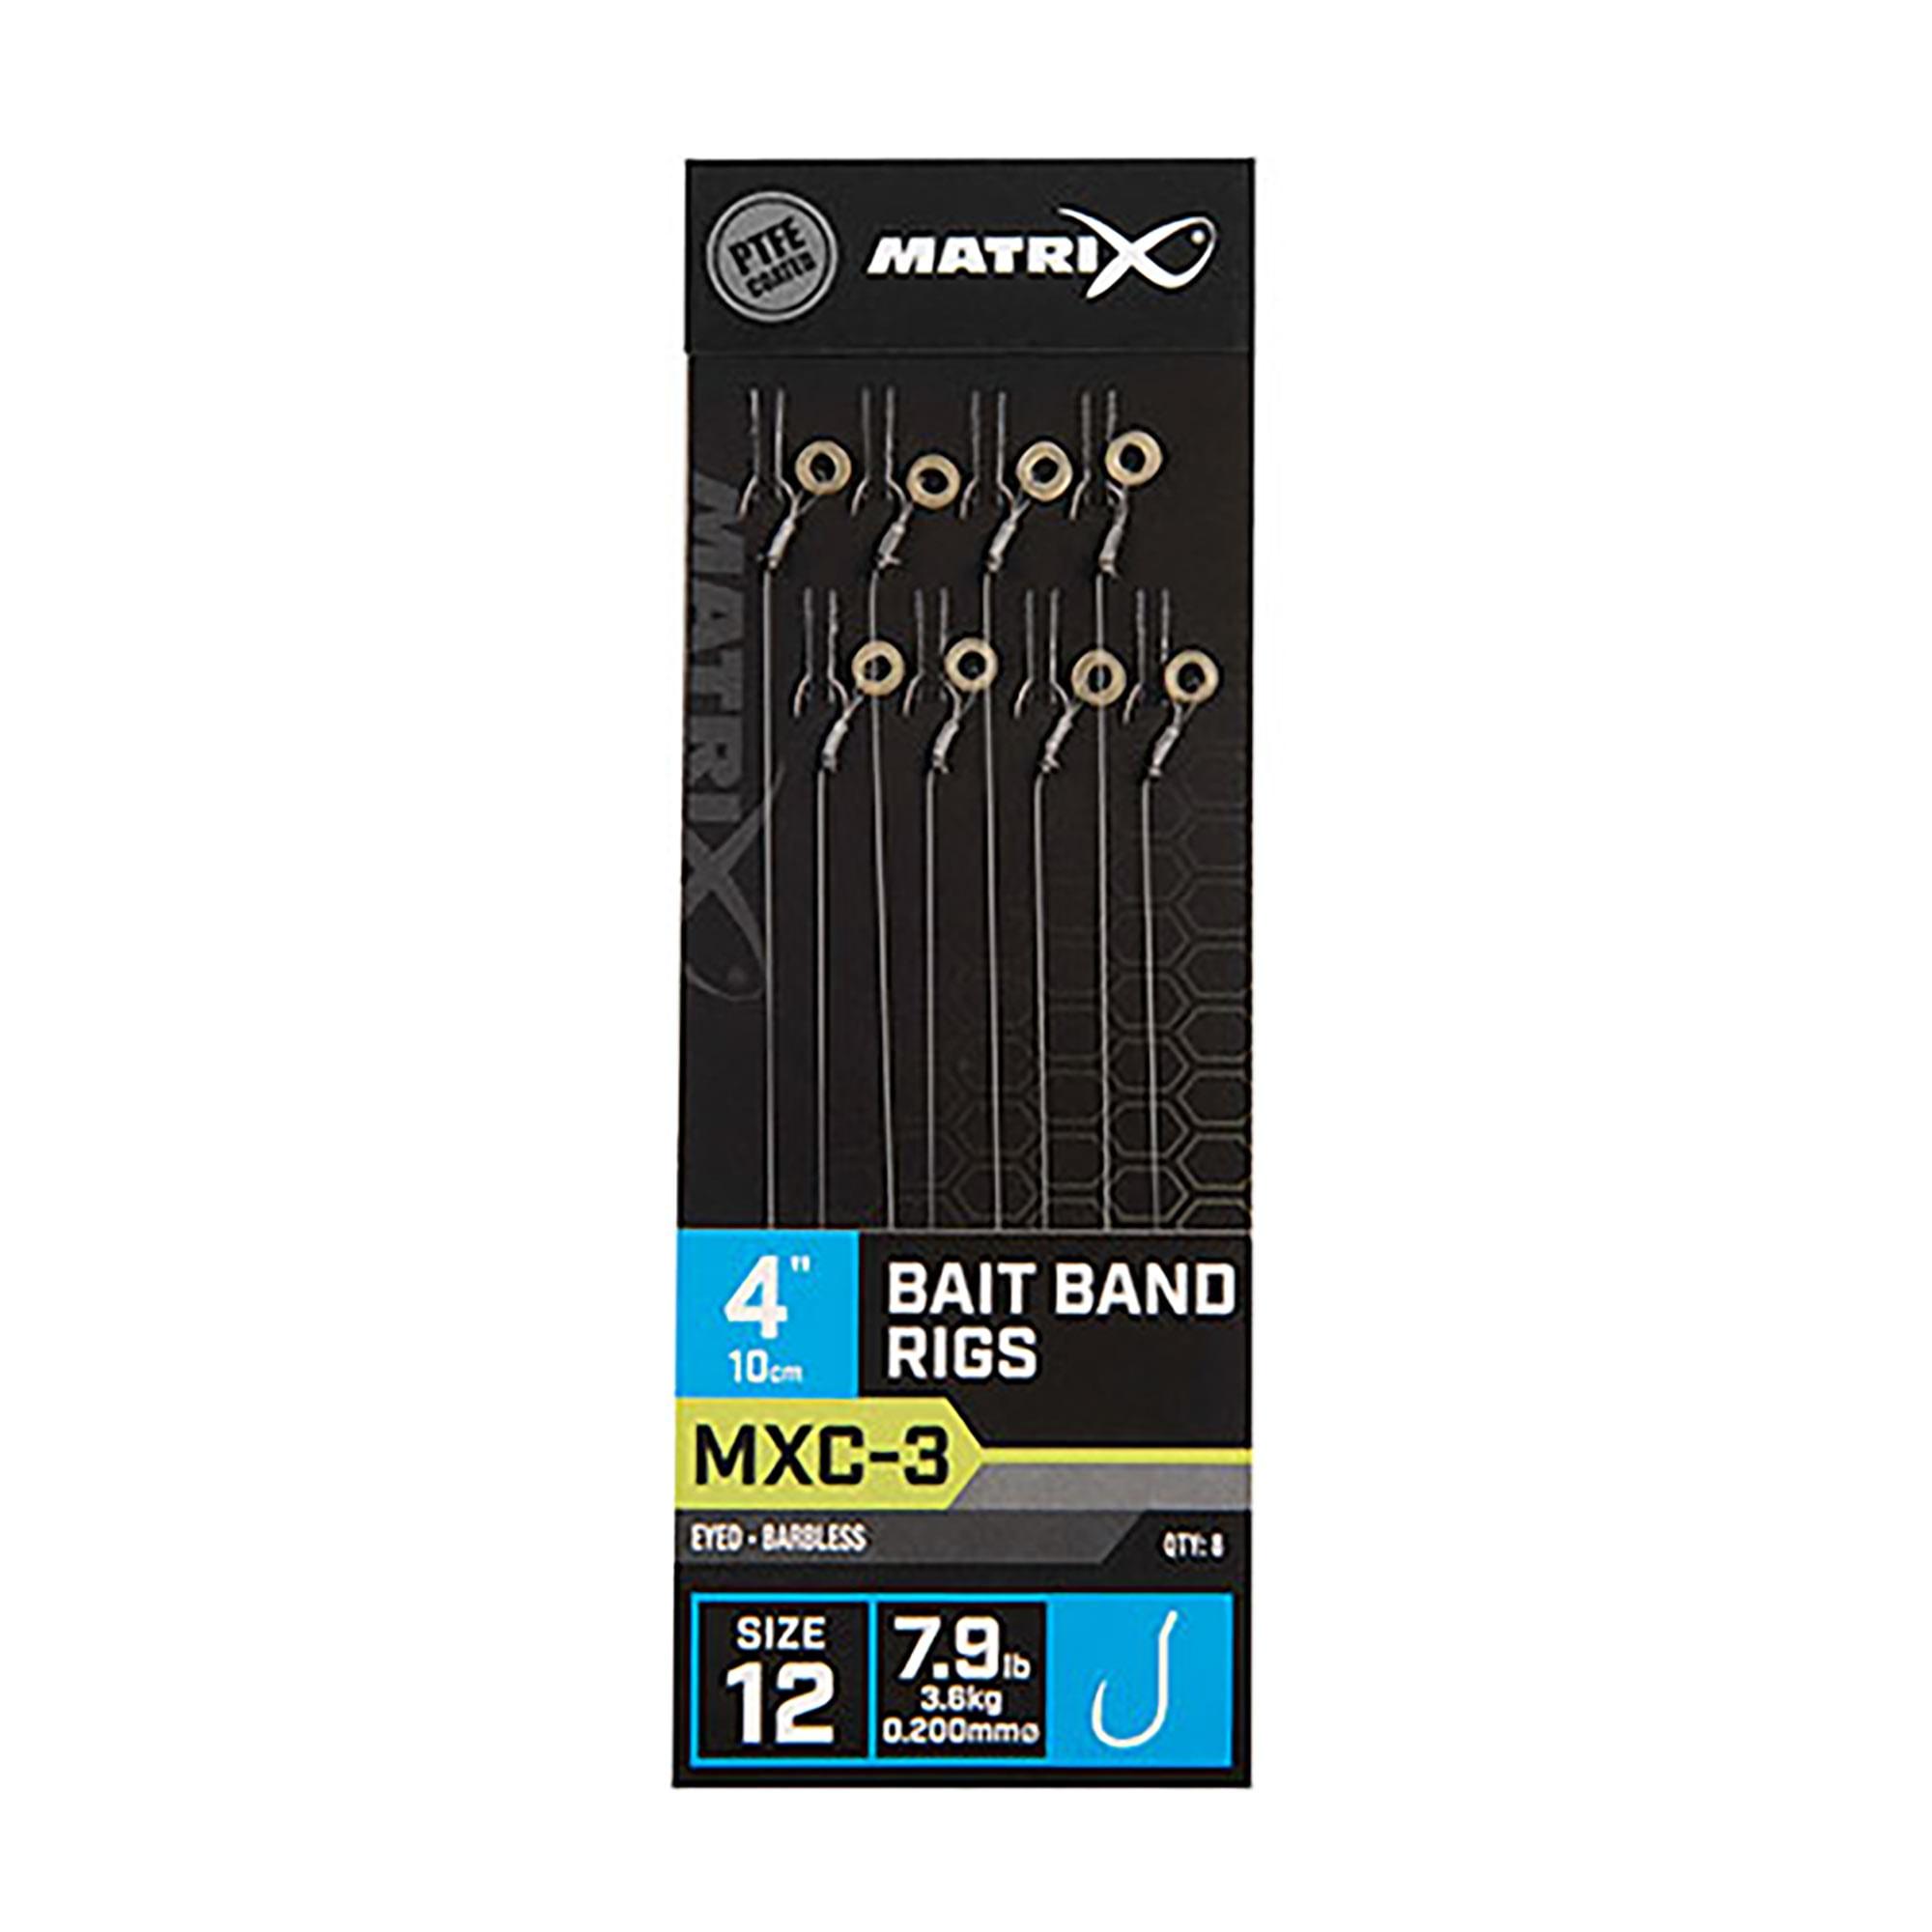 Ami hair Rig MXC-3 (Bait Band Rigs) MATRIX 10cm